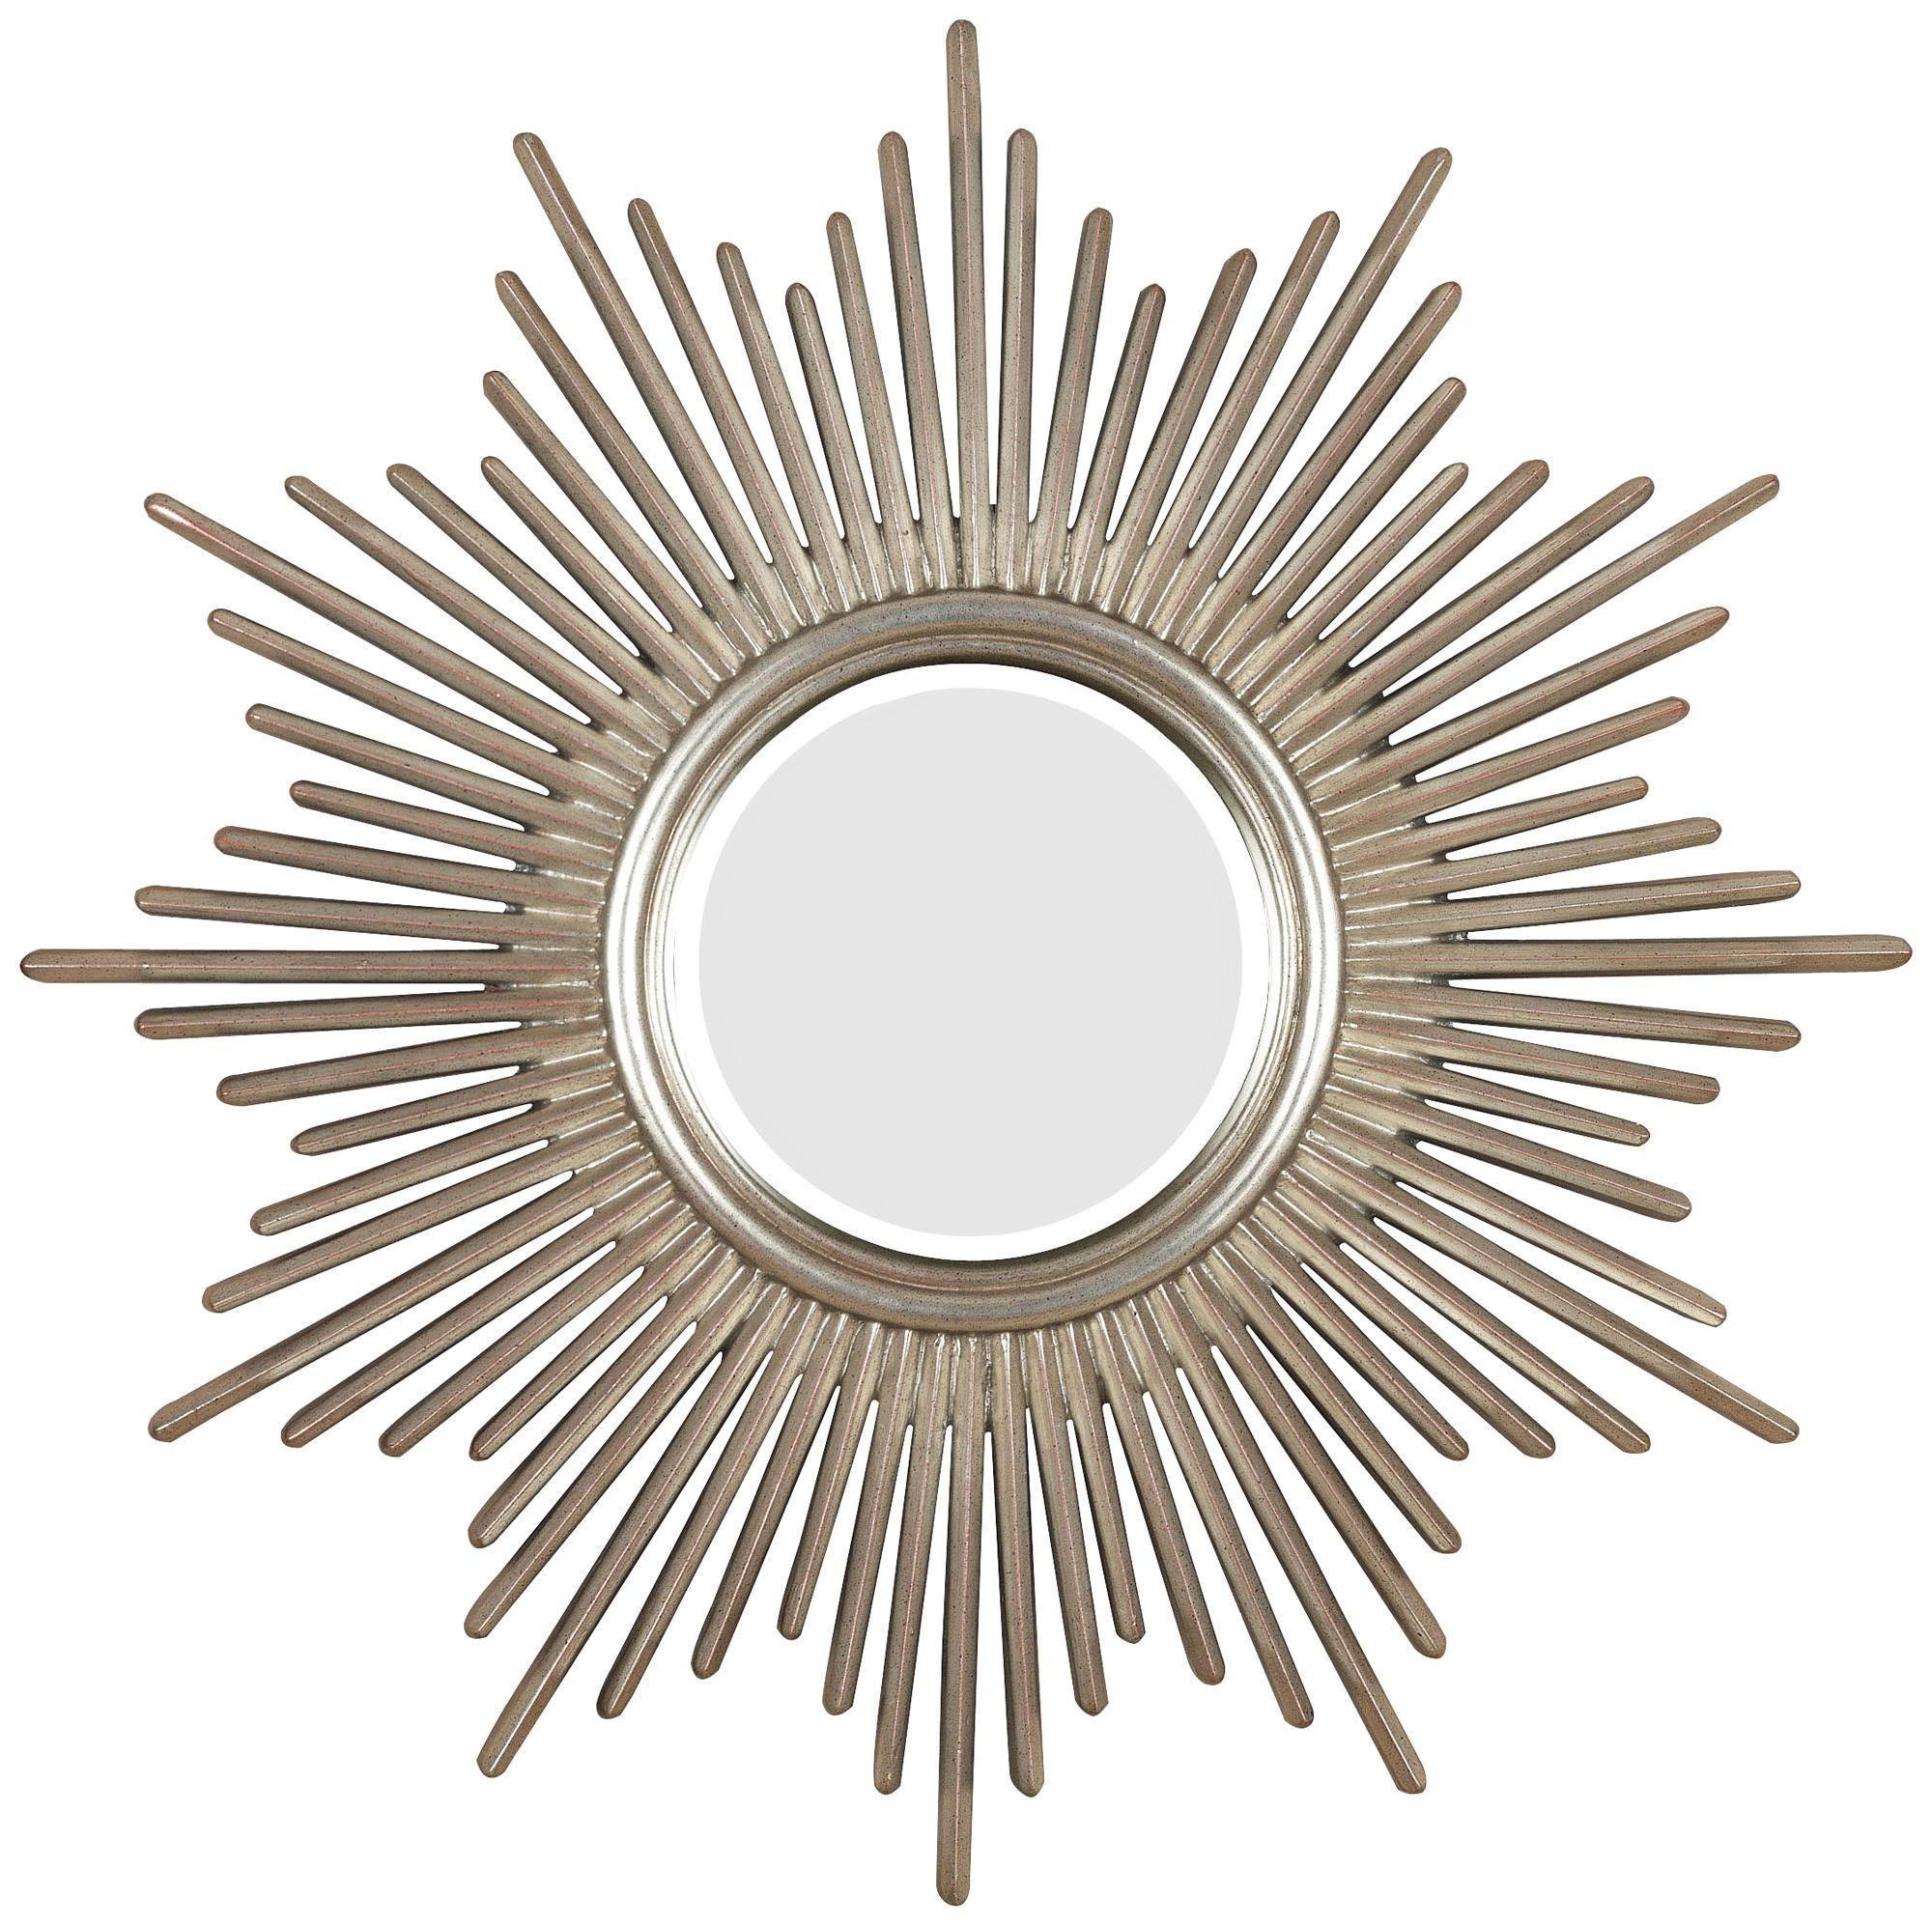 Wire capiz sunburst wall mirror - Sunburst Reflections 36 High Wall Mirror